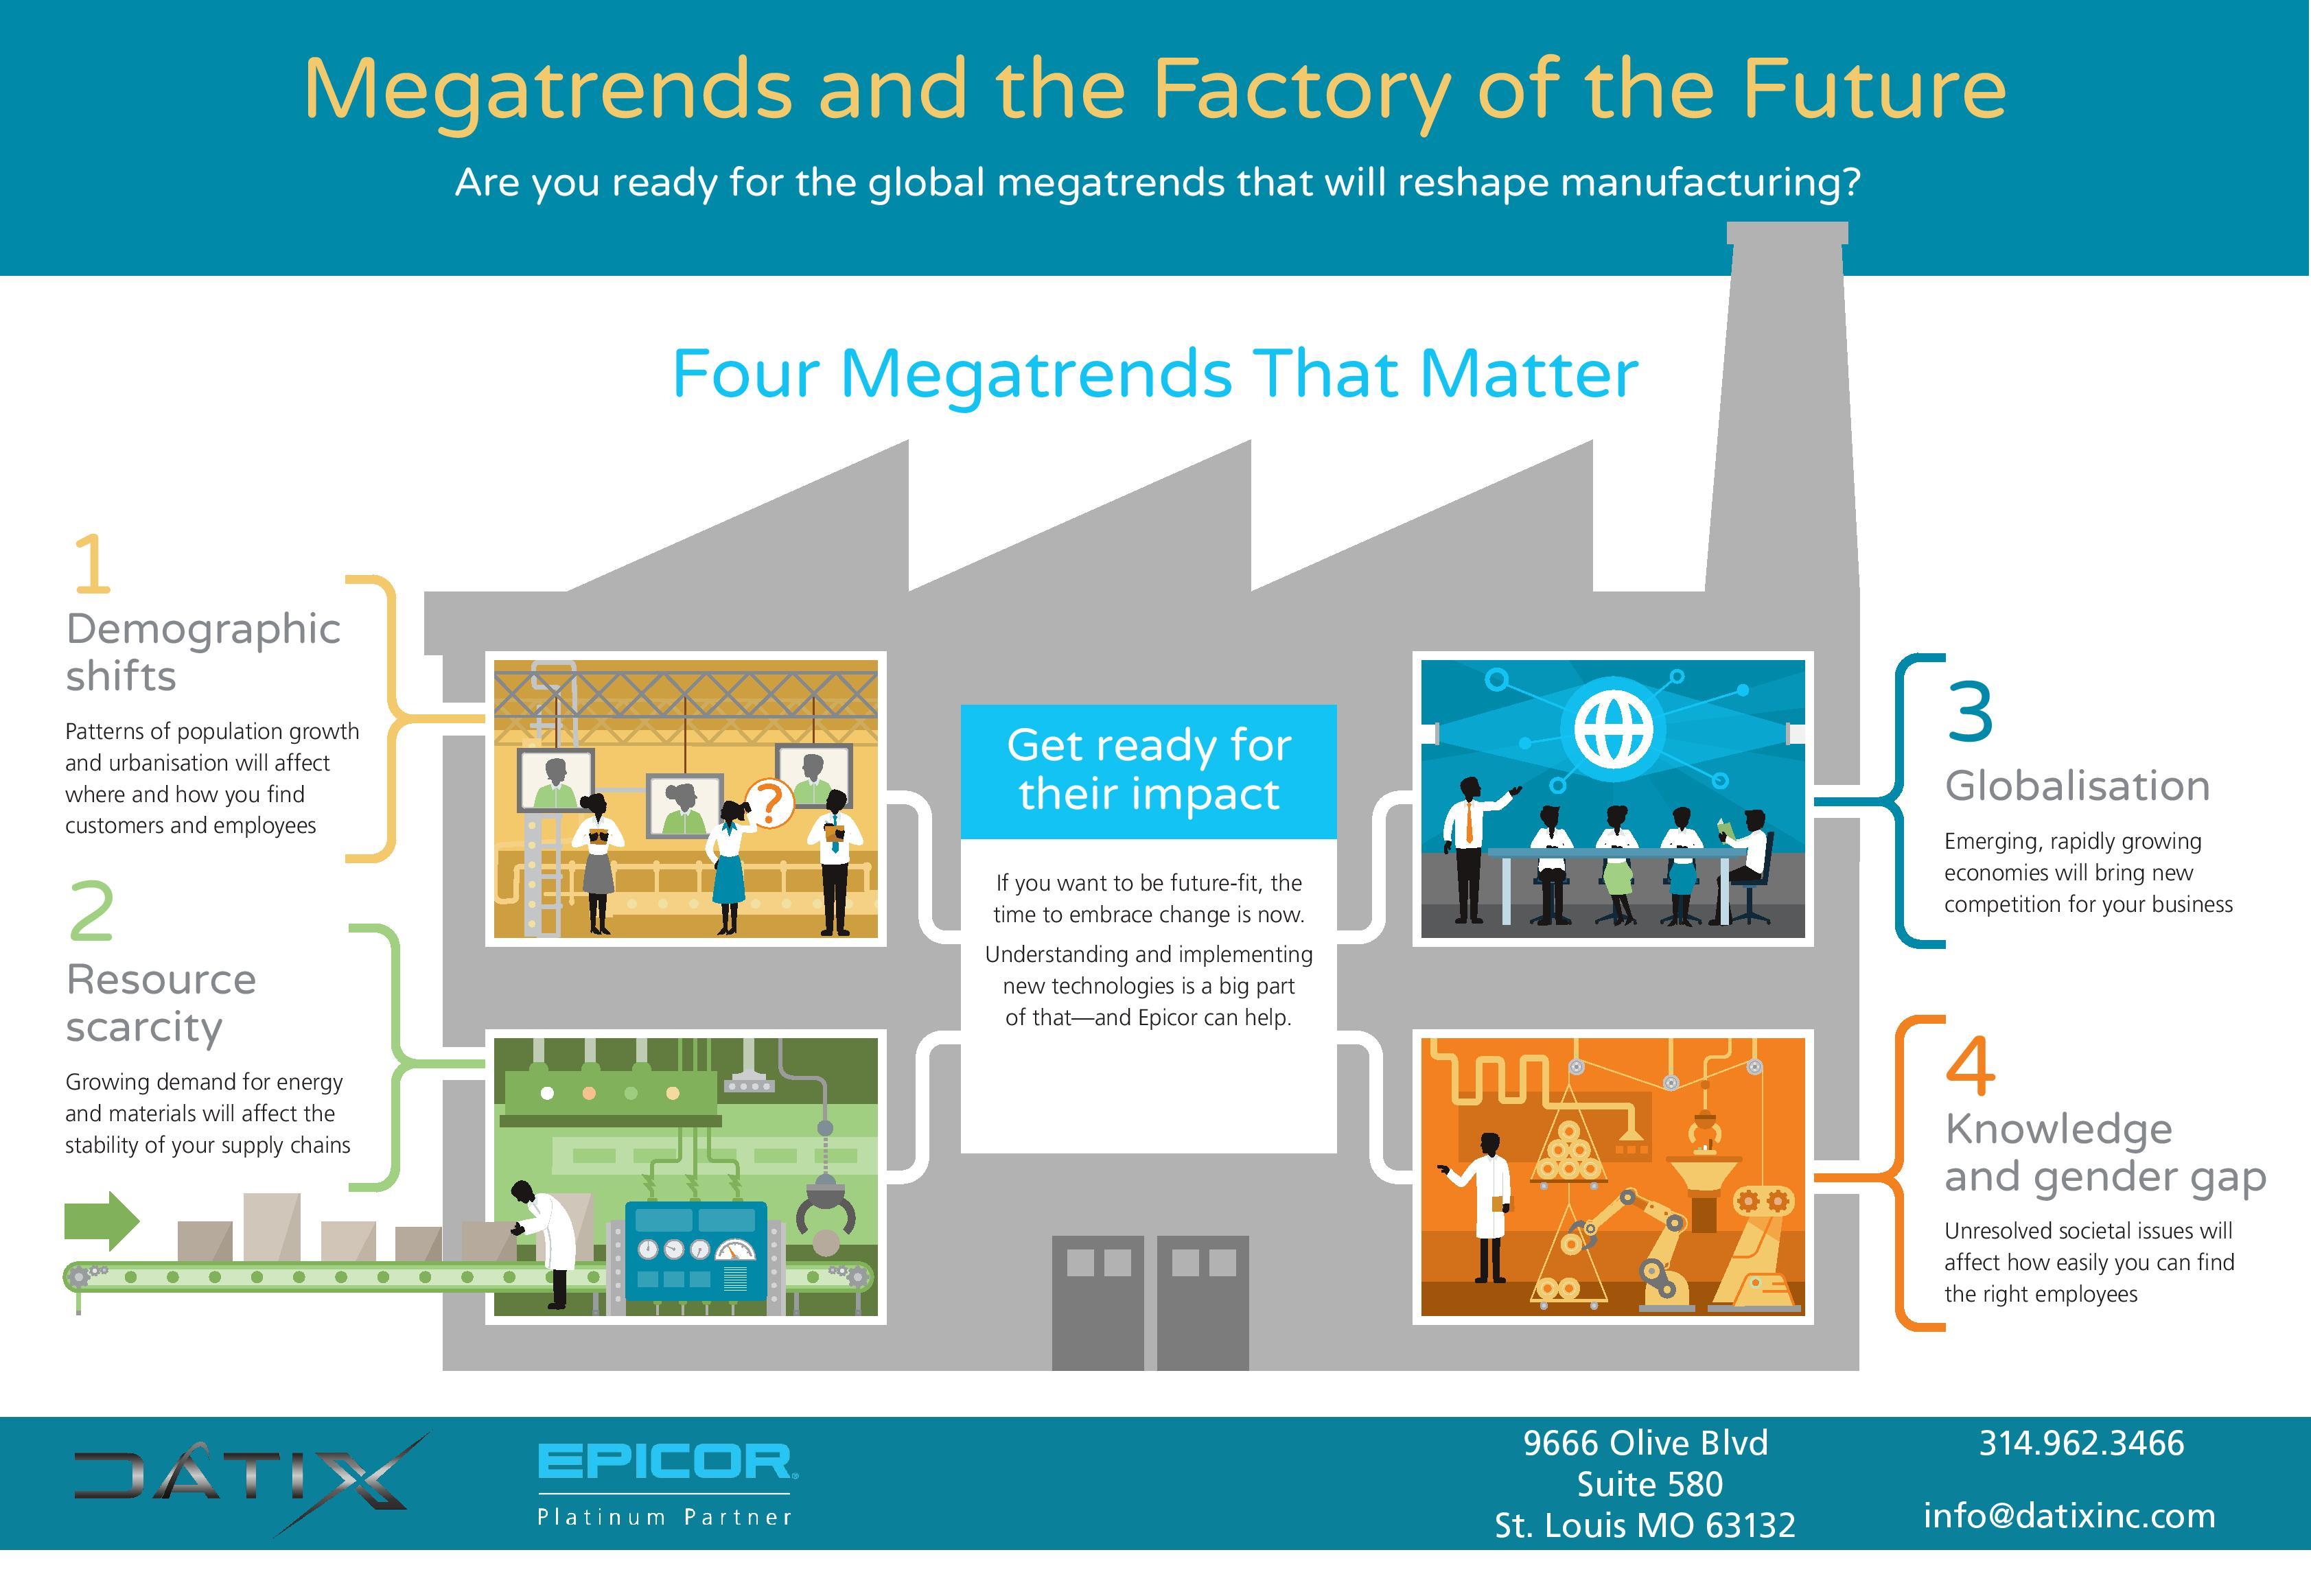 Epicor Manufacturing Megatrends